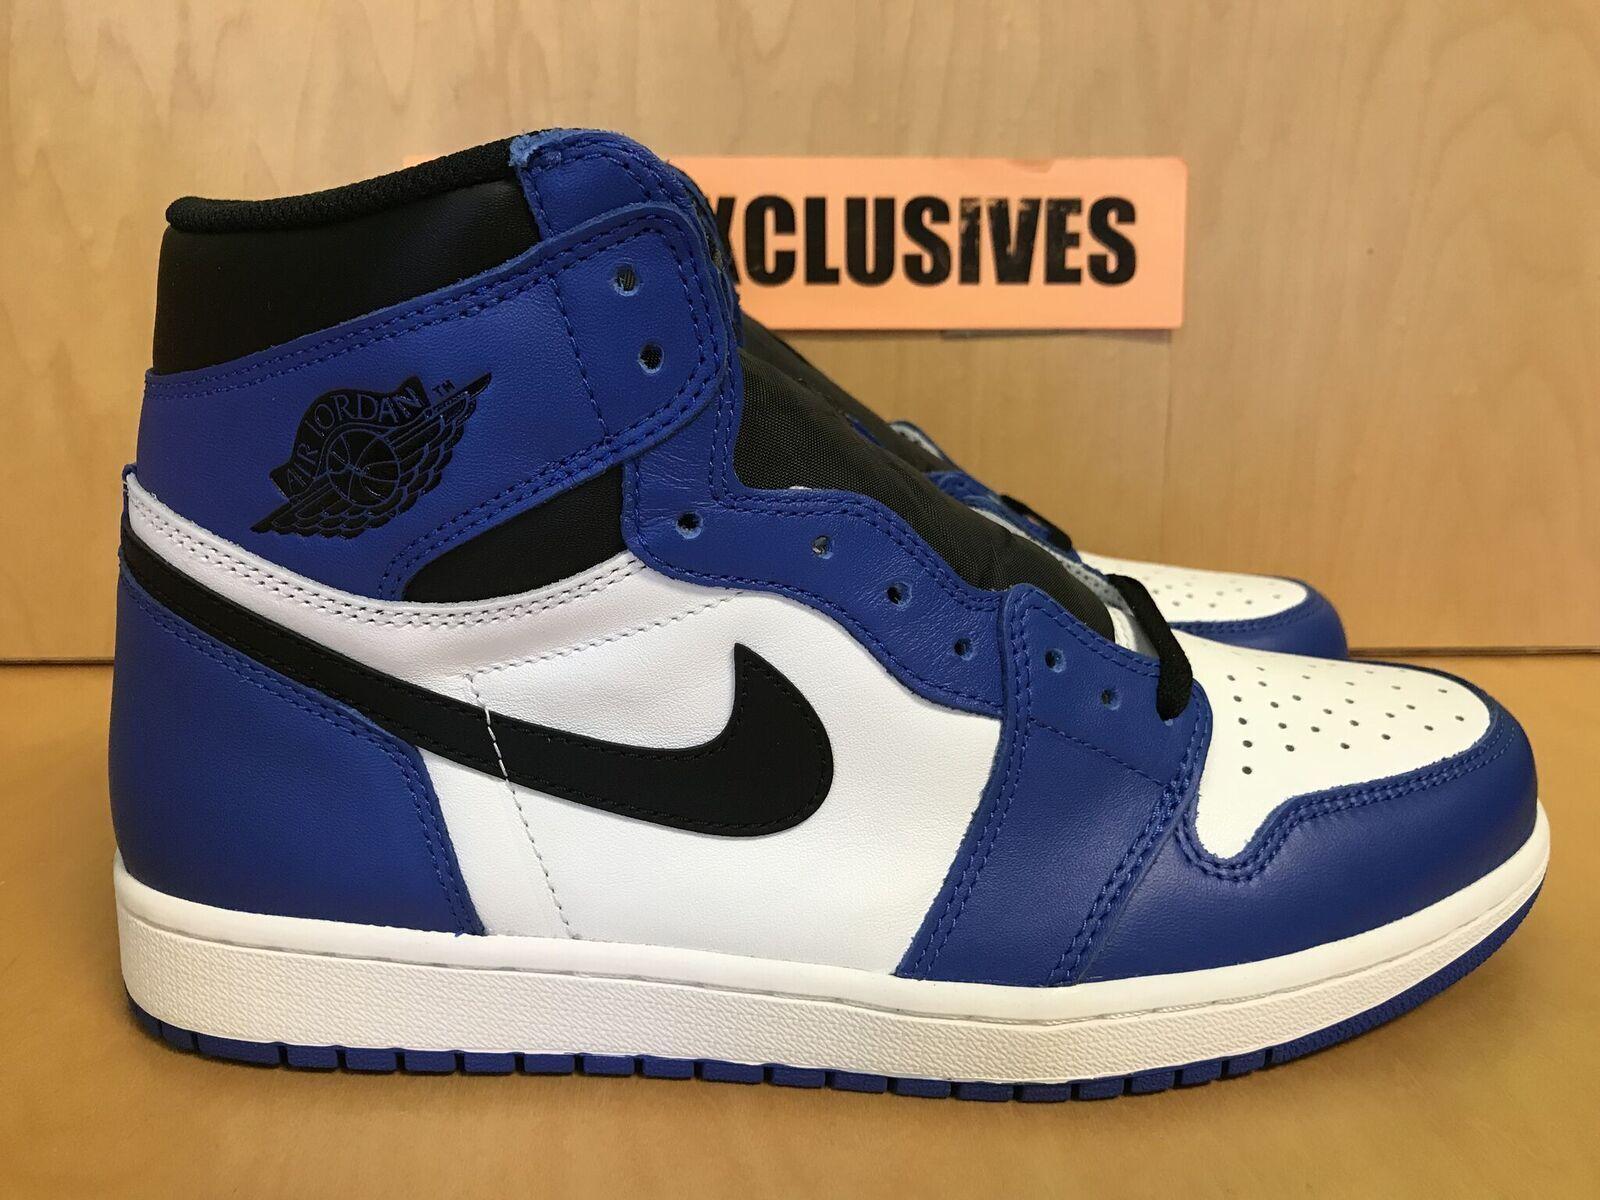 Nike air jordan 1 retrò sono alti og blu reale, neri e bianchi 555088-403 2018